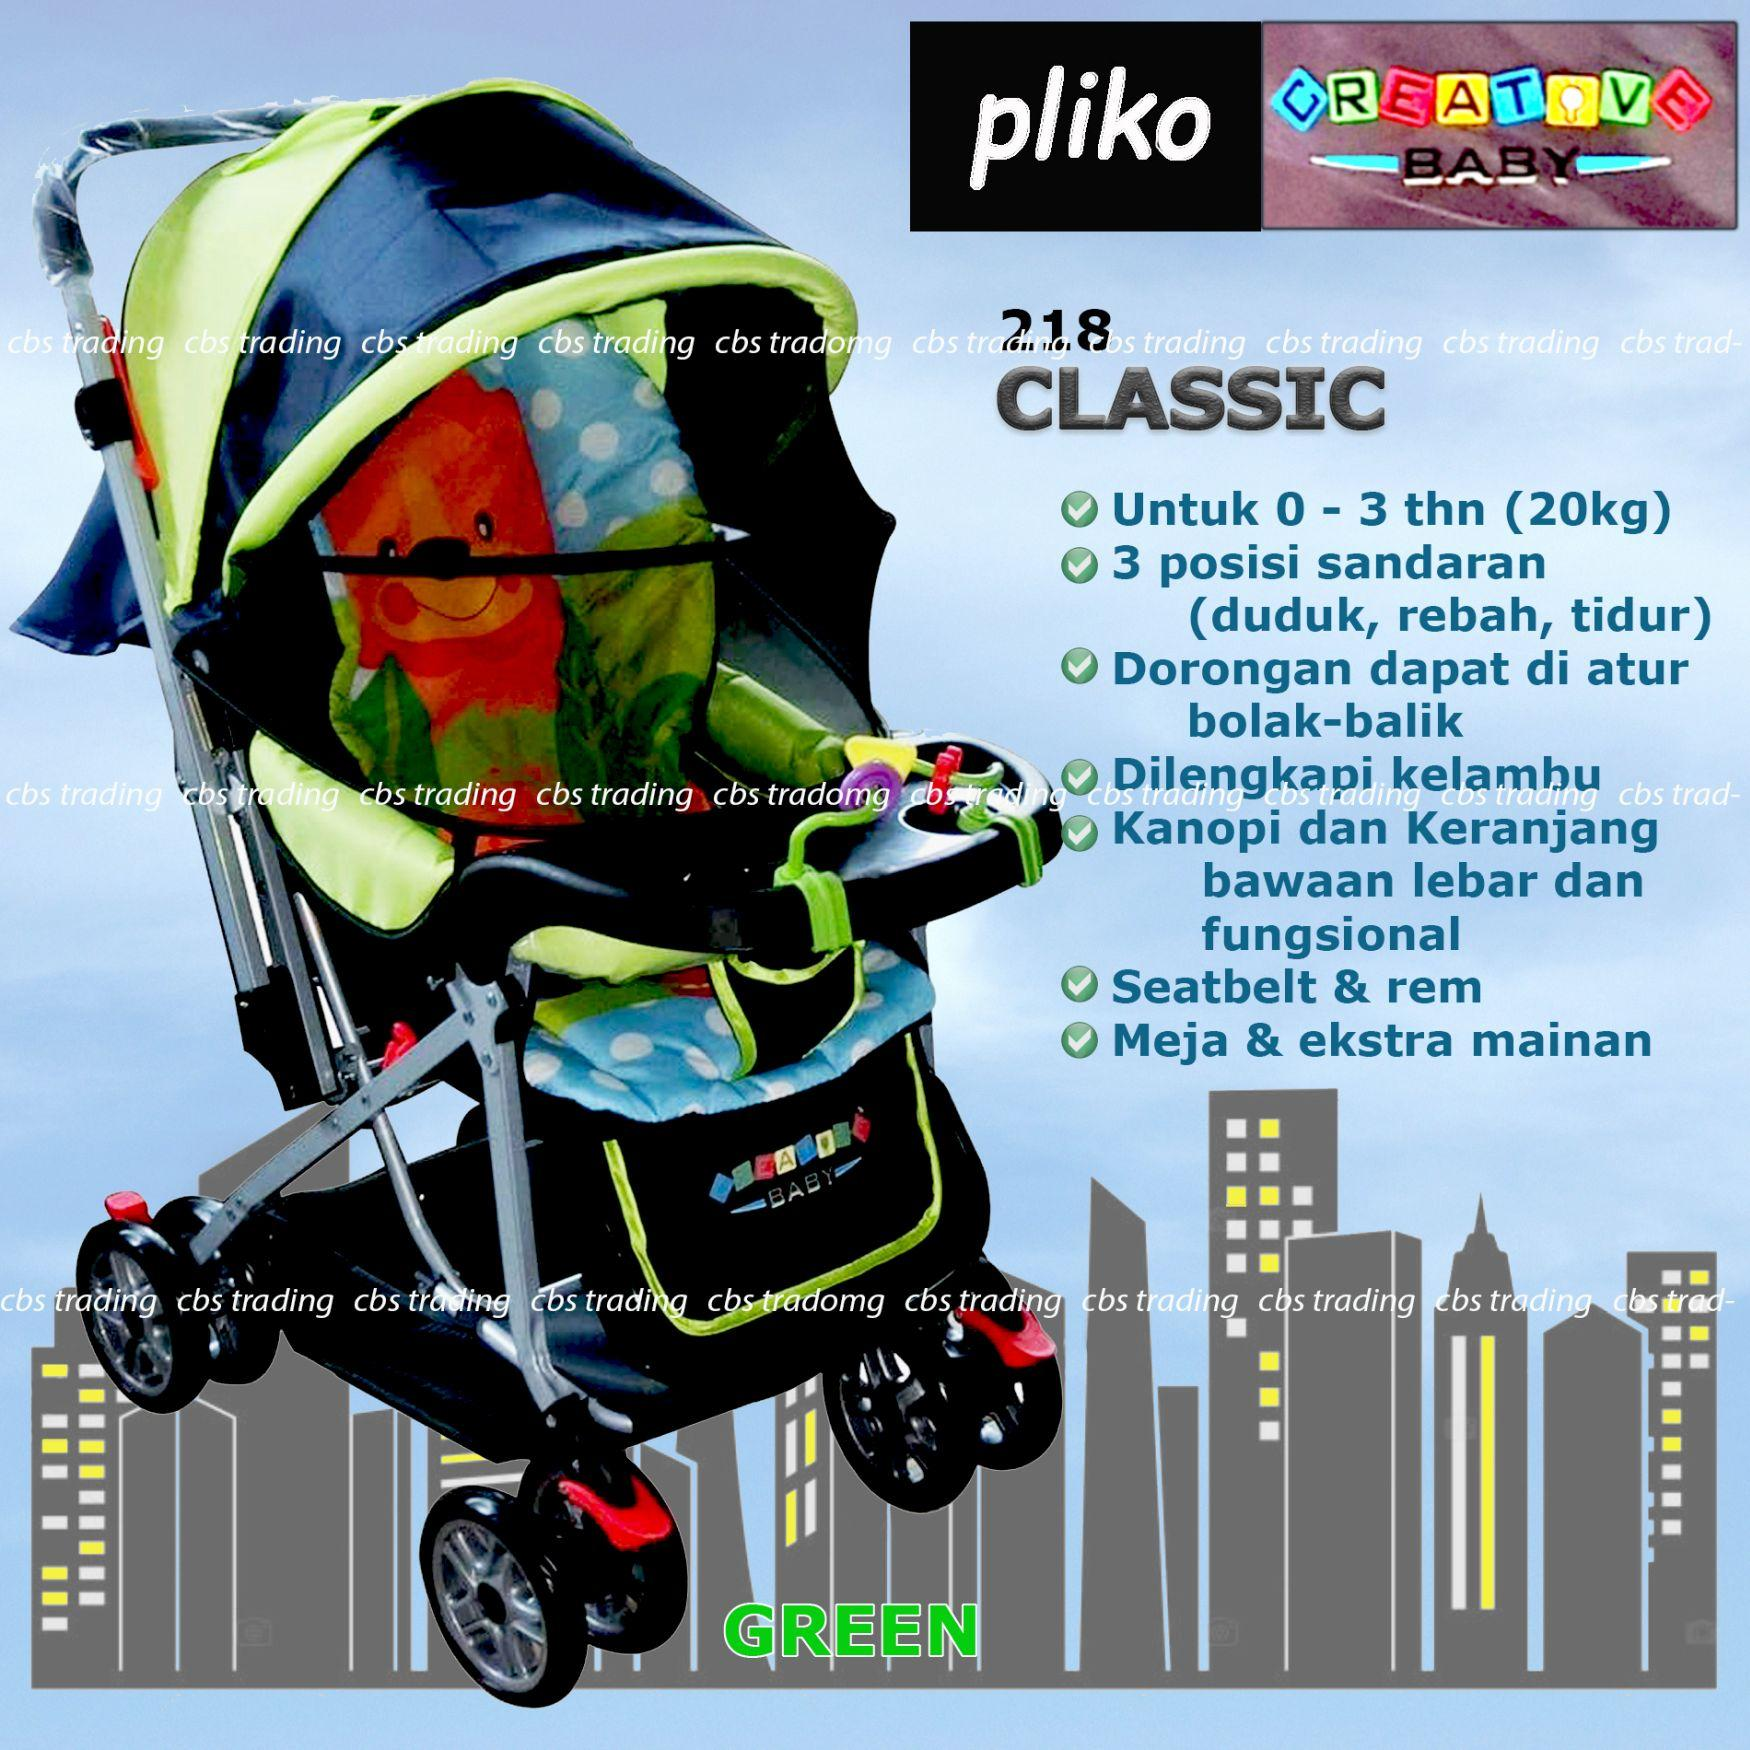 Pliko Creative Classic Baby Stroller BS-218 Lightweight - Kereta Dorong Bayi - Hijau